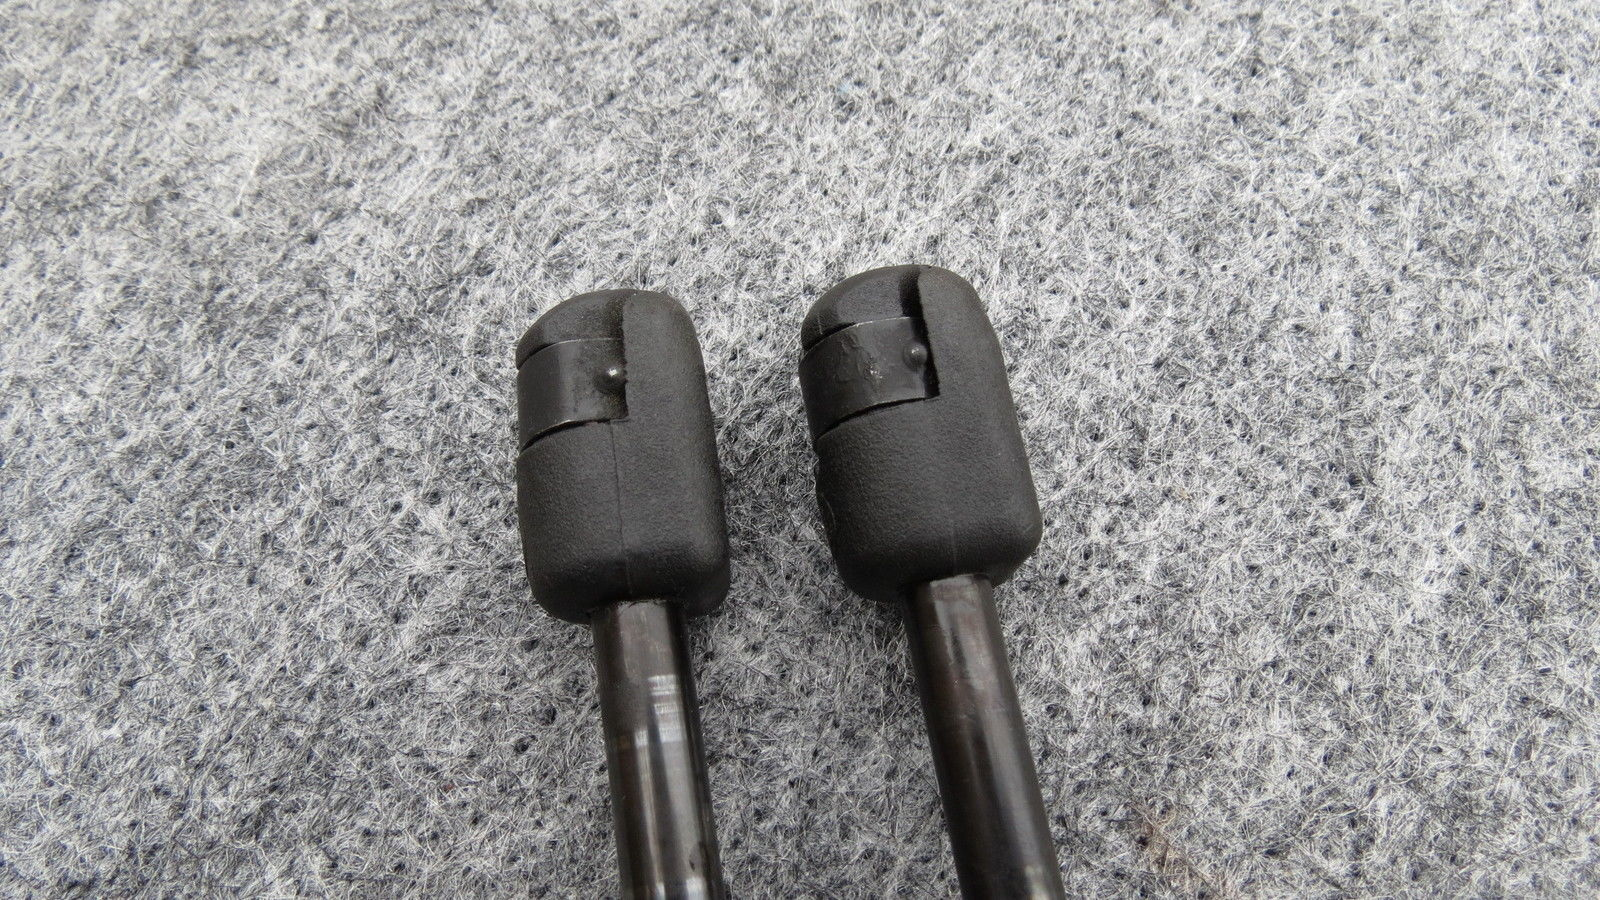 02-06 mini cooper R53 R50 R52 oem left n right hood support strut SET 7175020 ..